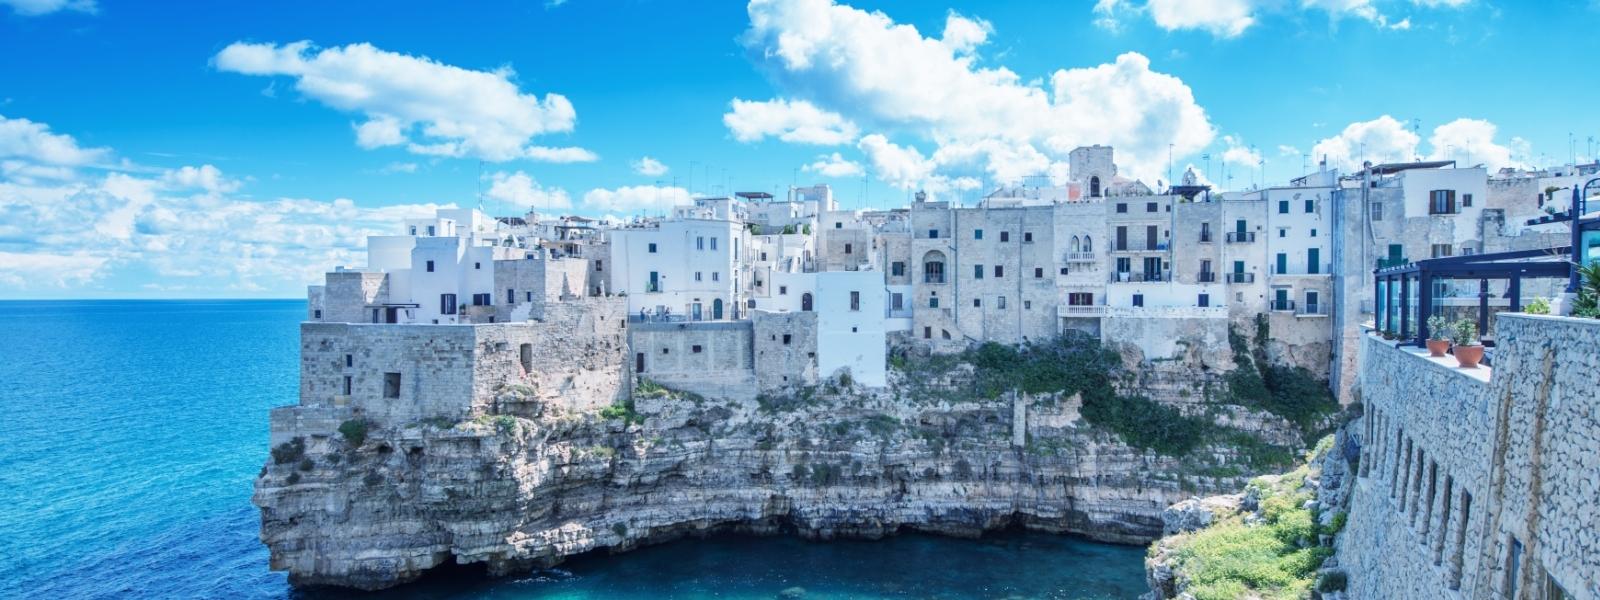 Sunny Italy & Puglia Small Group Tour